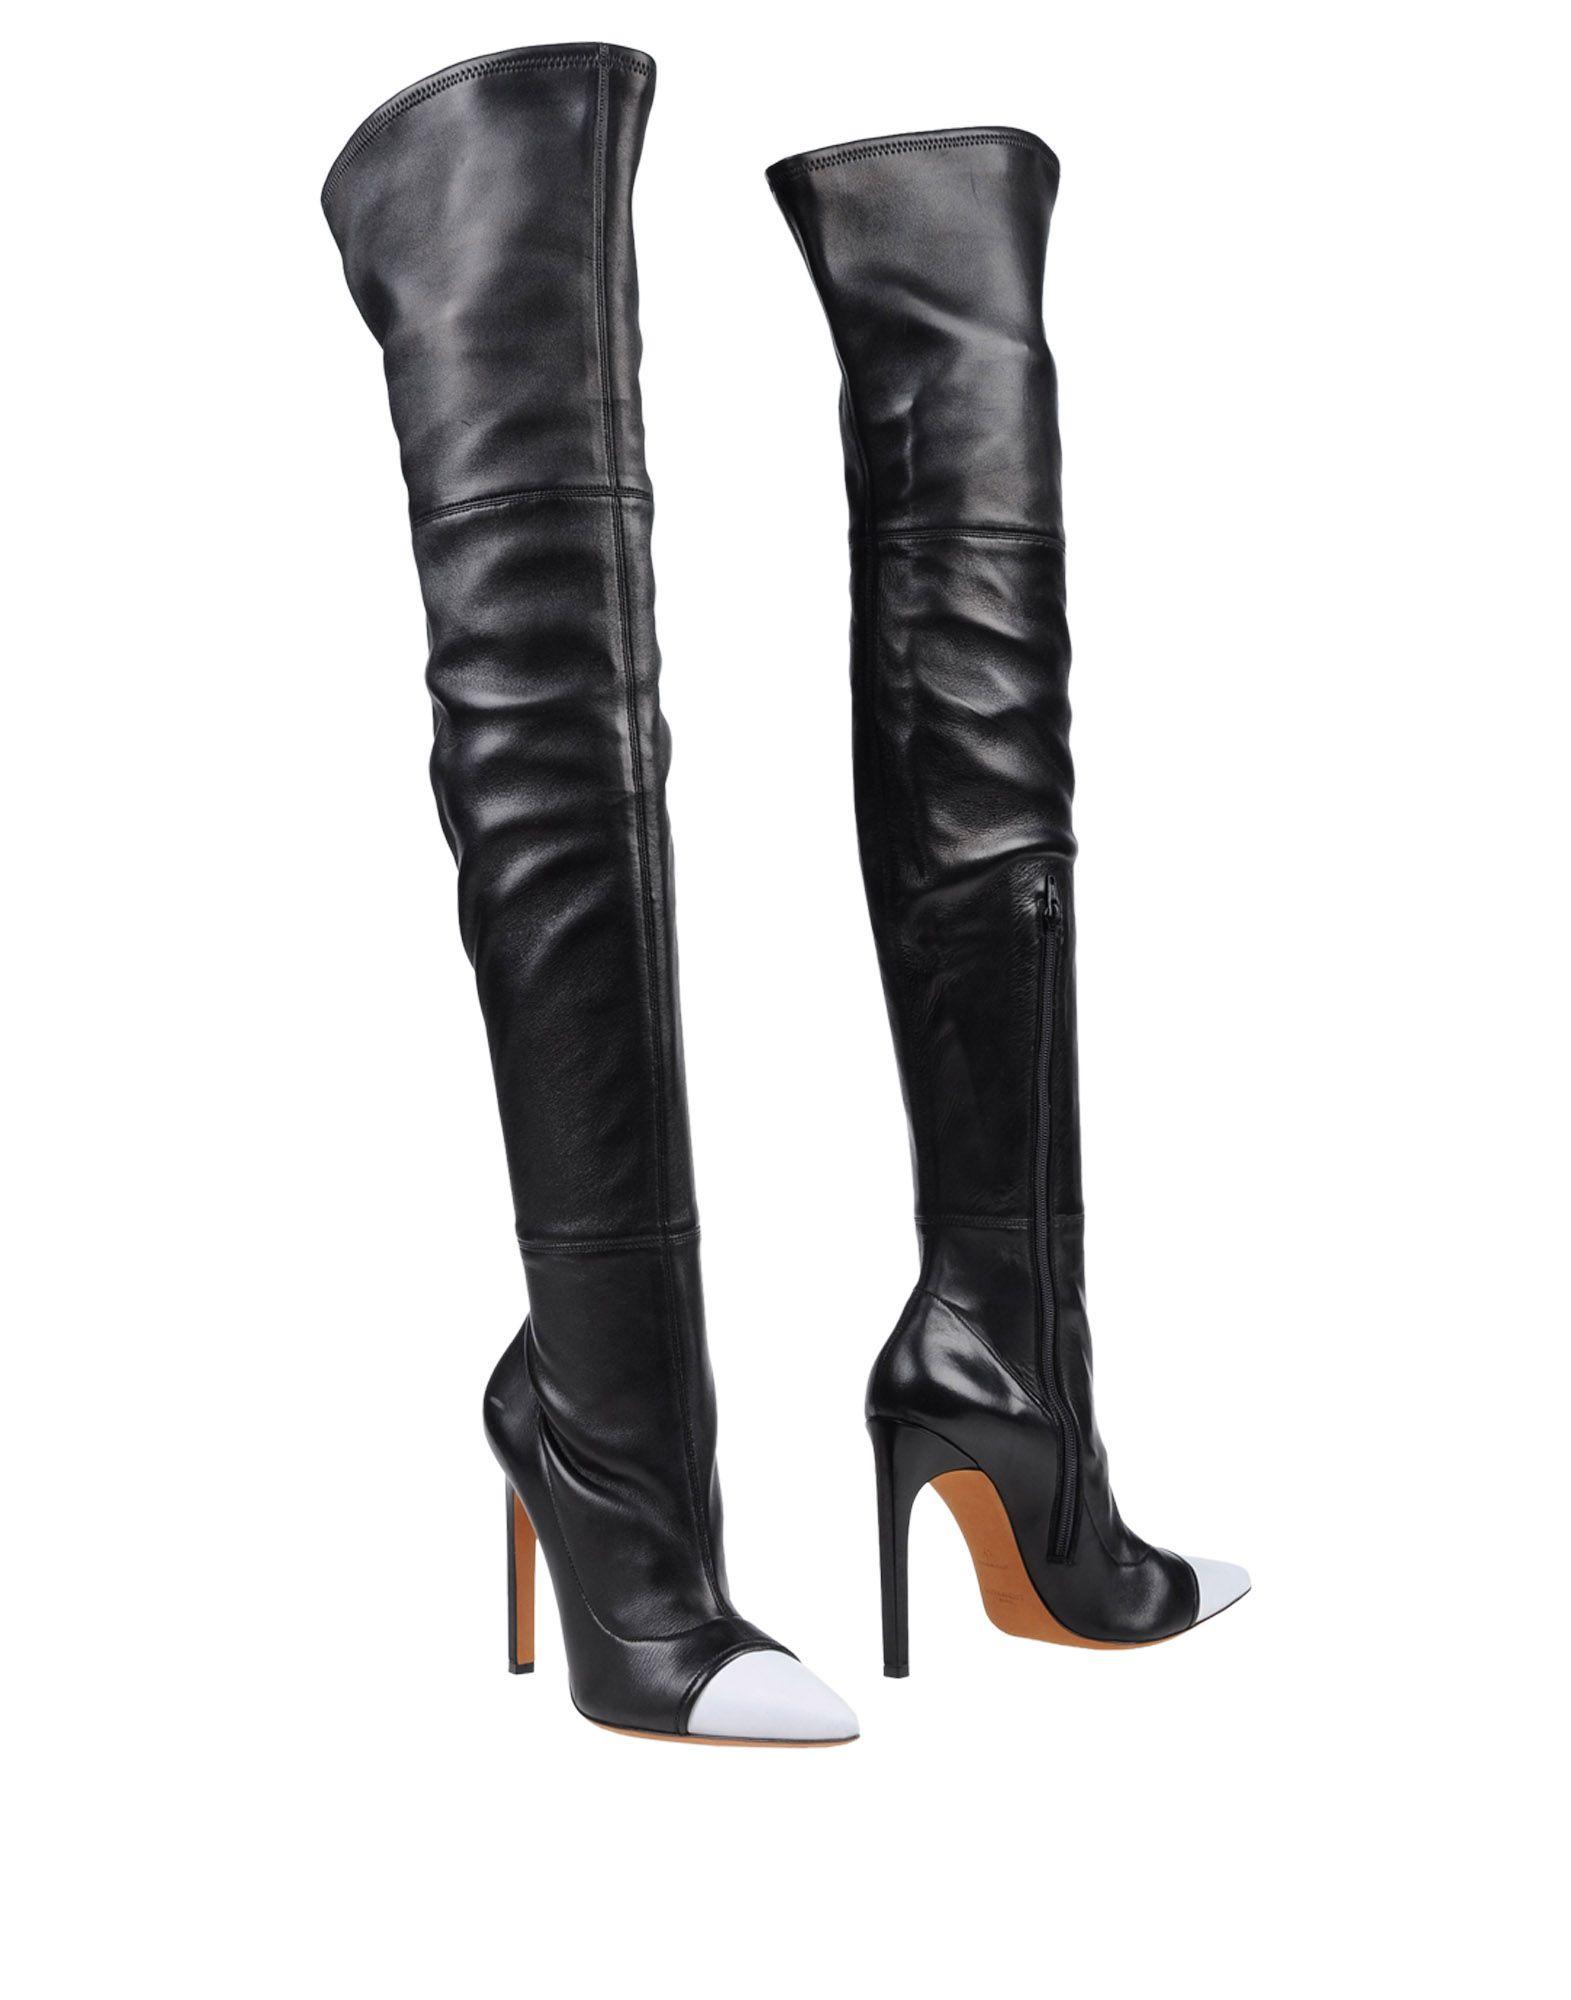 Bottes Givenchy Femme - Bottes Givenchy sur